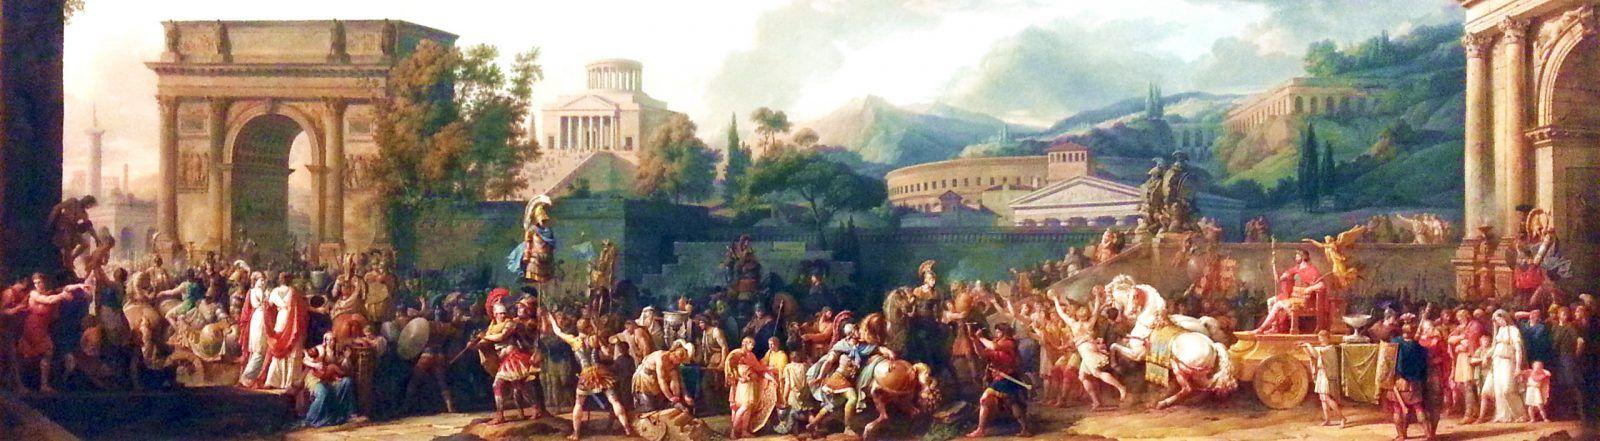 СЕНАТОР представляет: картина торжественного триумфа Эмилия Павла в Риме — The Triumph of Aemilius Paulus